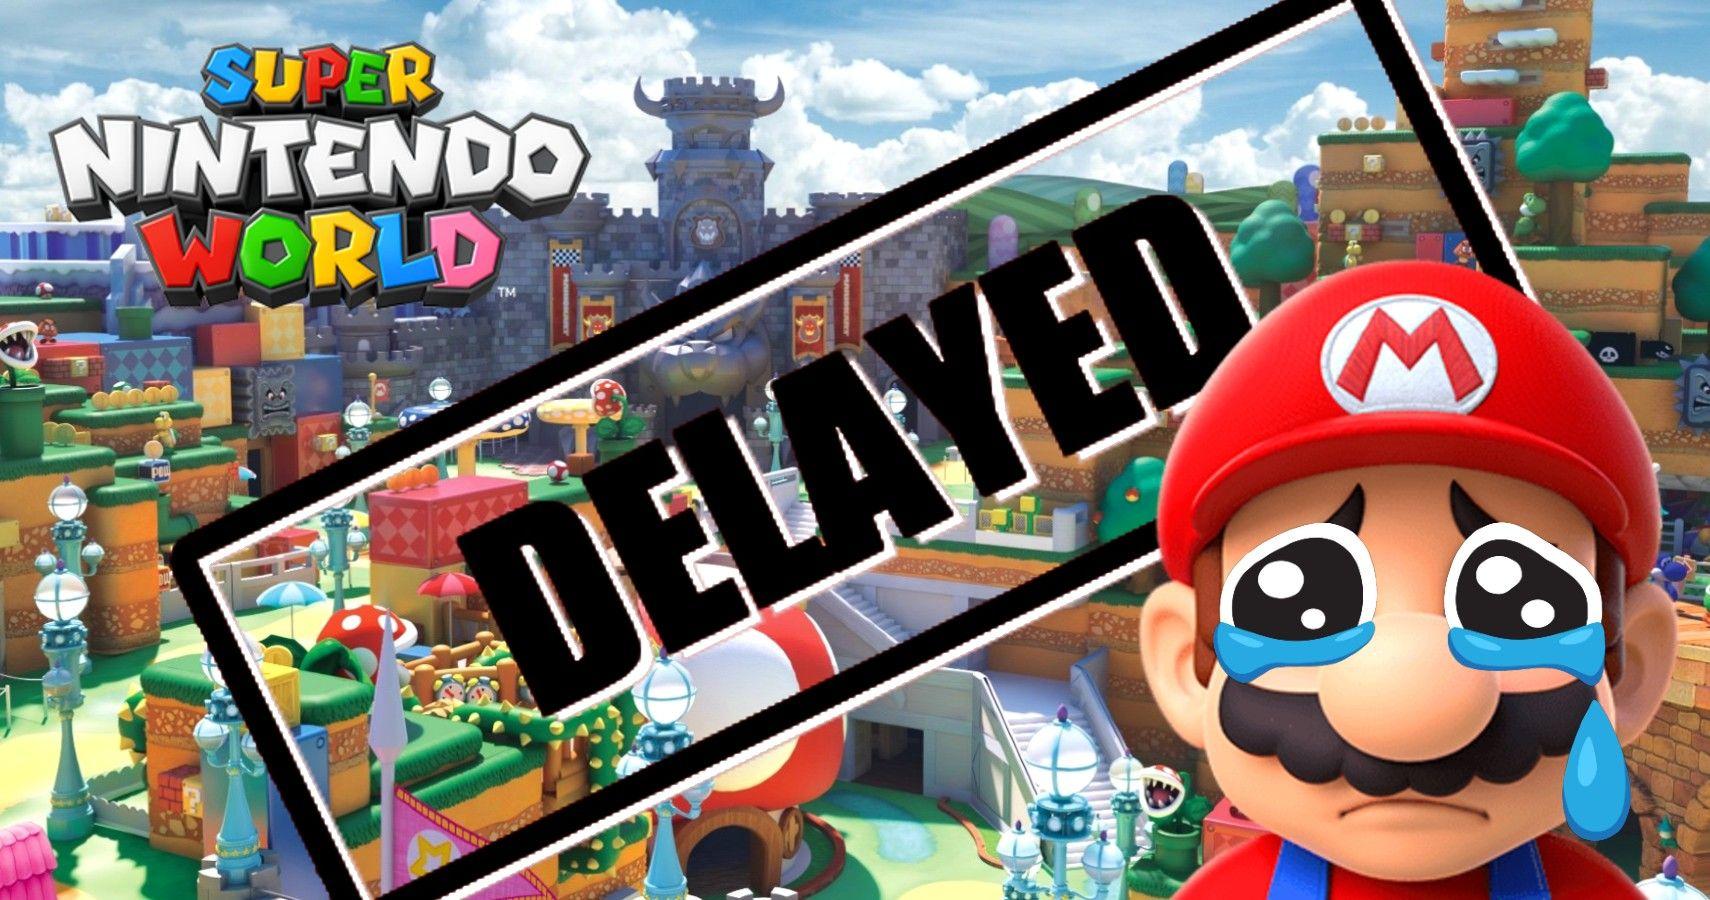 Super Nintendo World At Universal Orlando Has Been Delayed Indefinitely